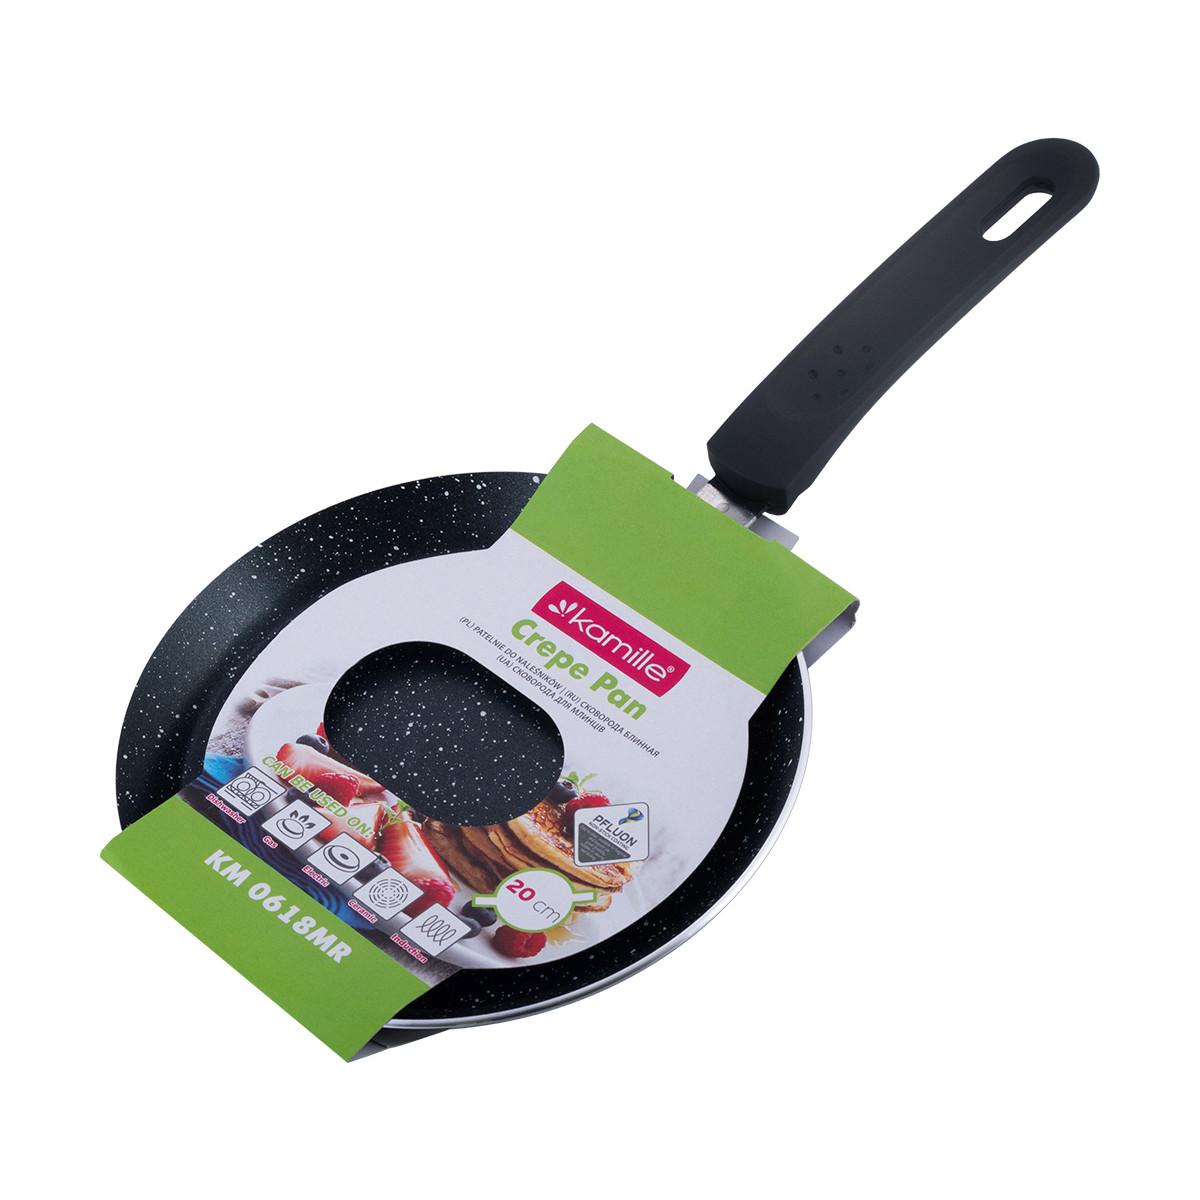 Сковорода блинная Kamille 20см с мраморным покрытием KM-0618MR